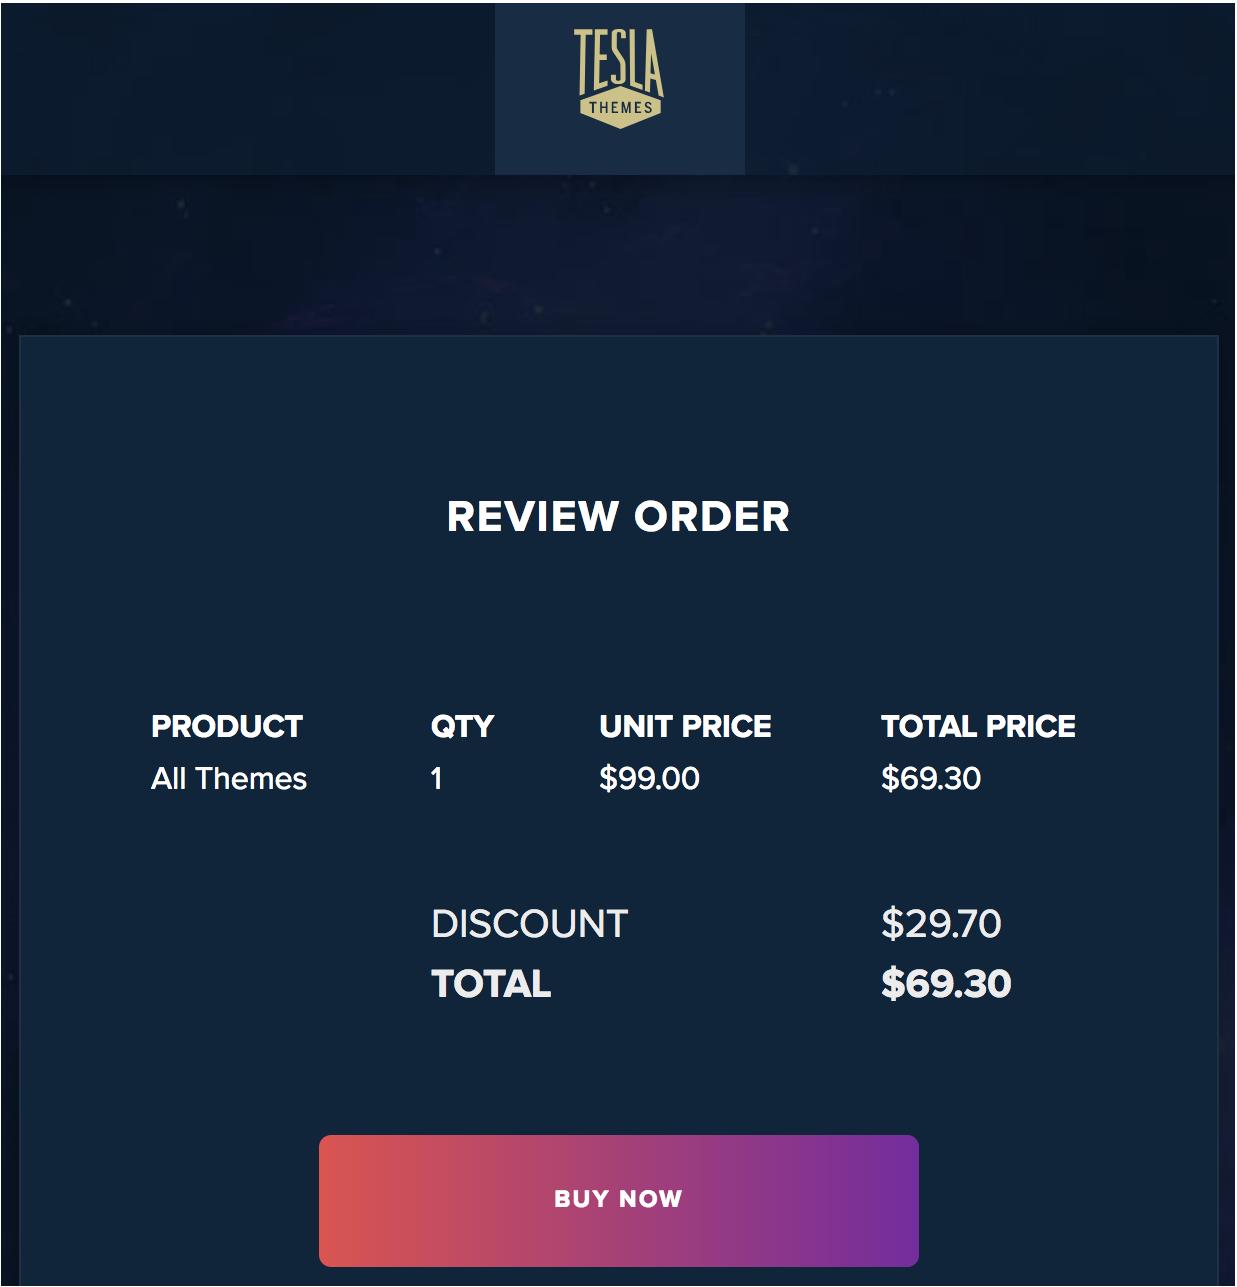 tesla themes coupon, tesla themes discount, tesla themes discount coupon